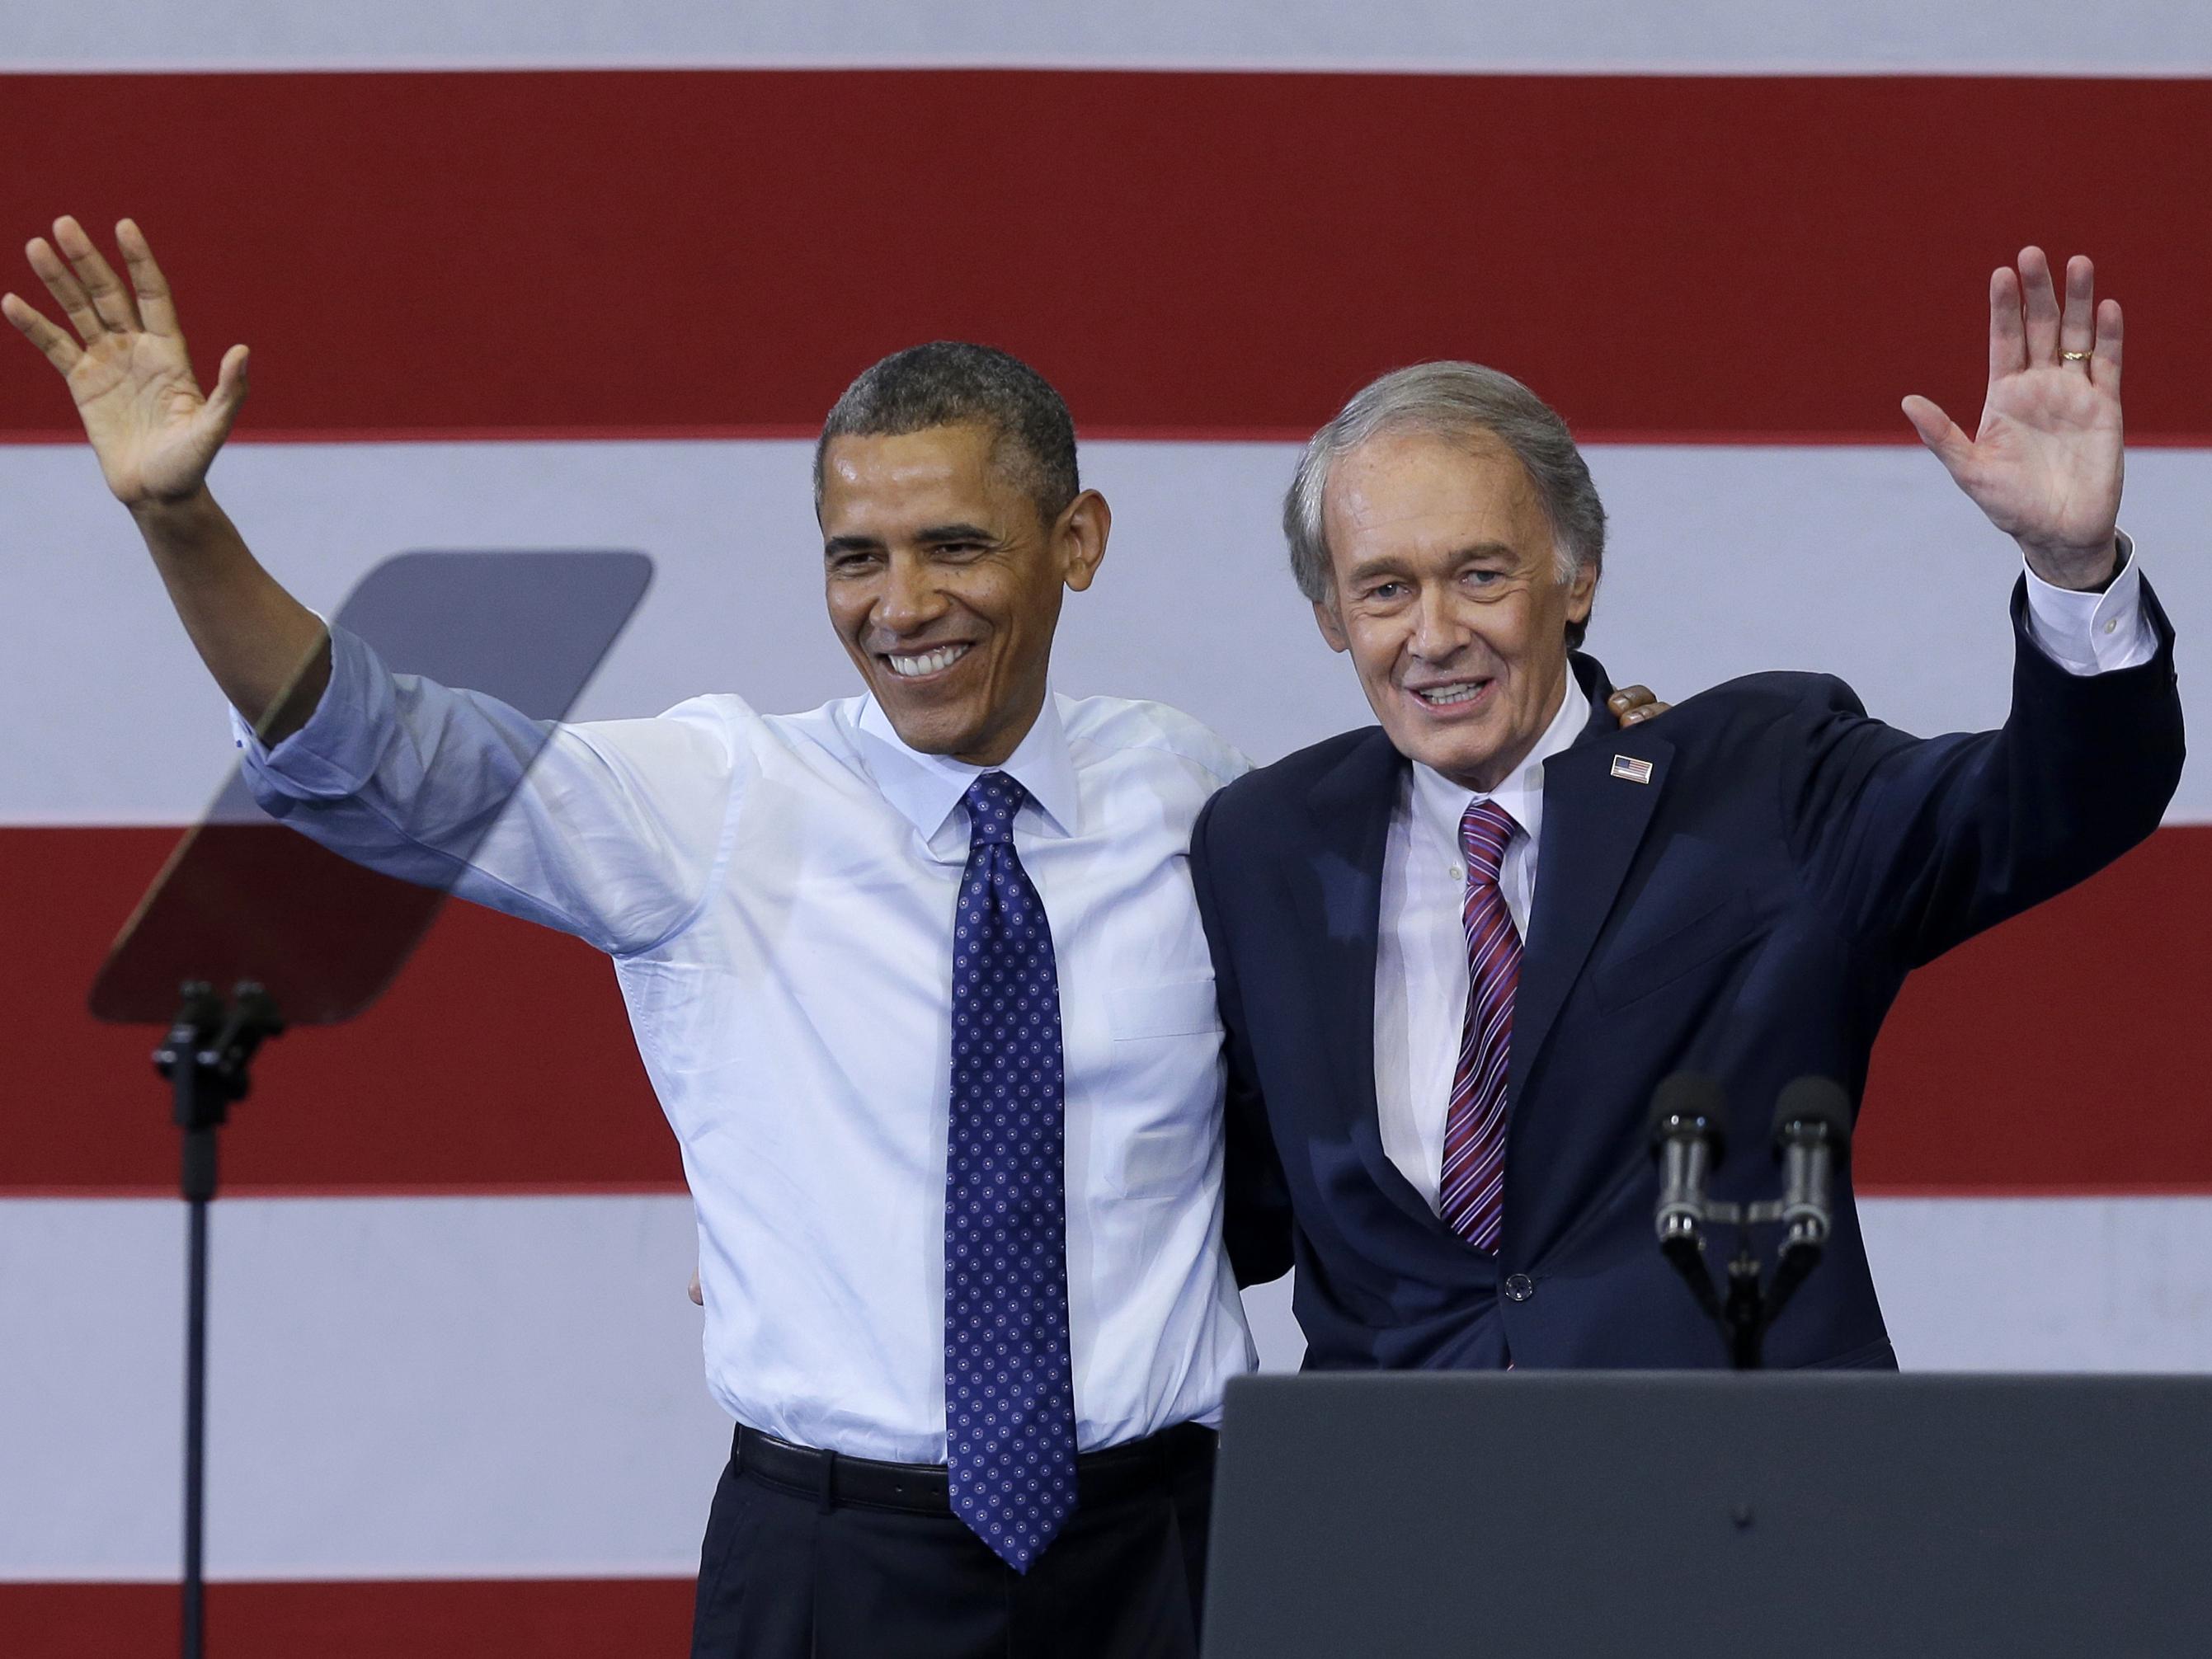 The Senator Who Dodged The Syria Vote